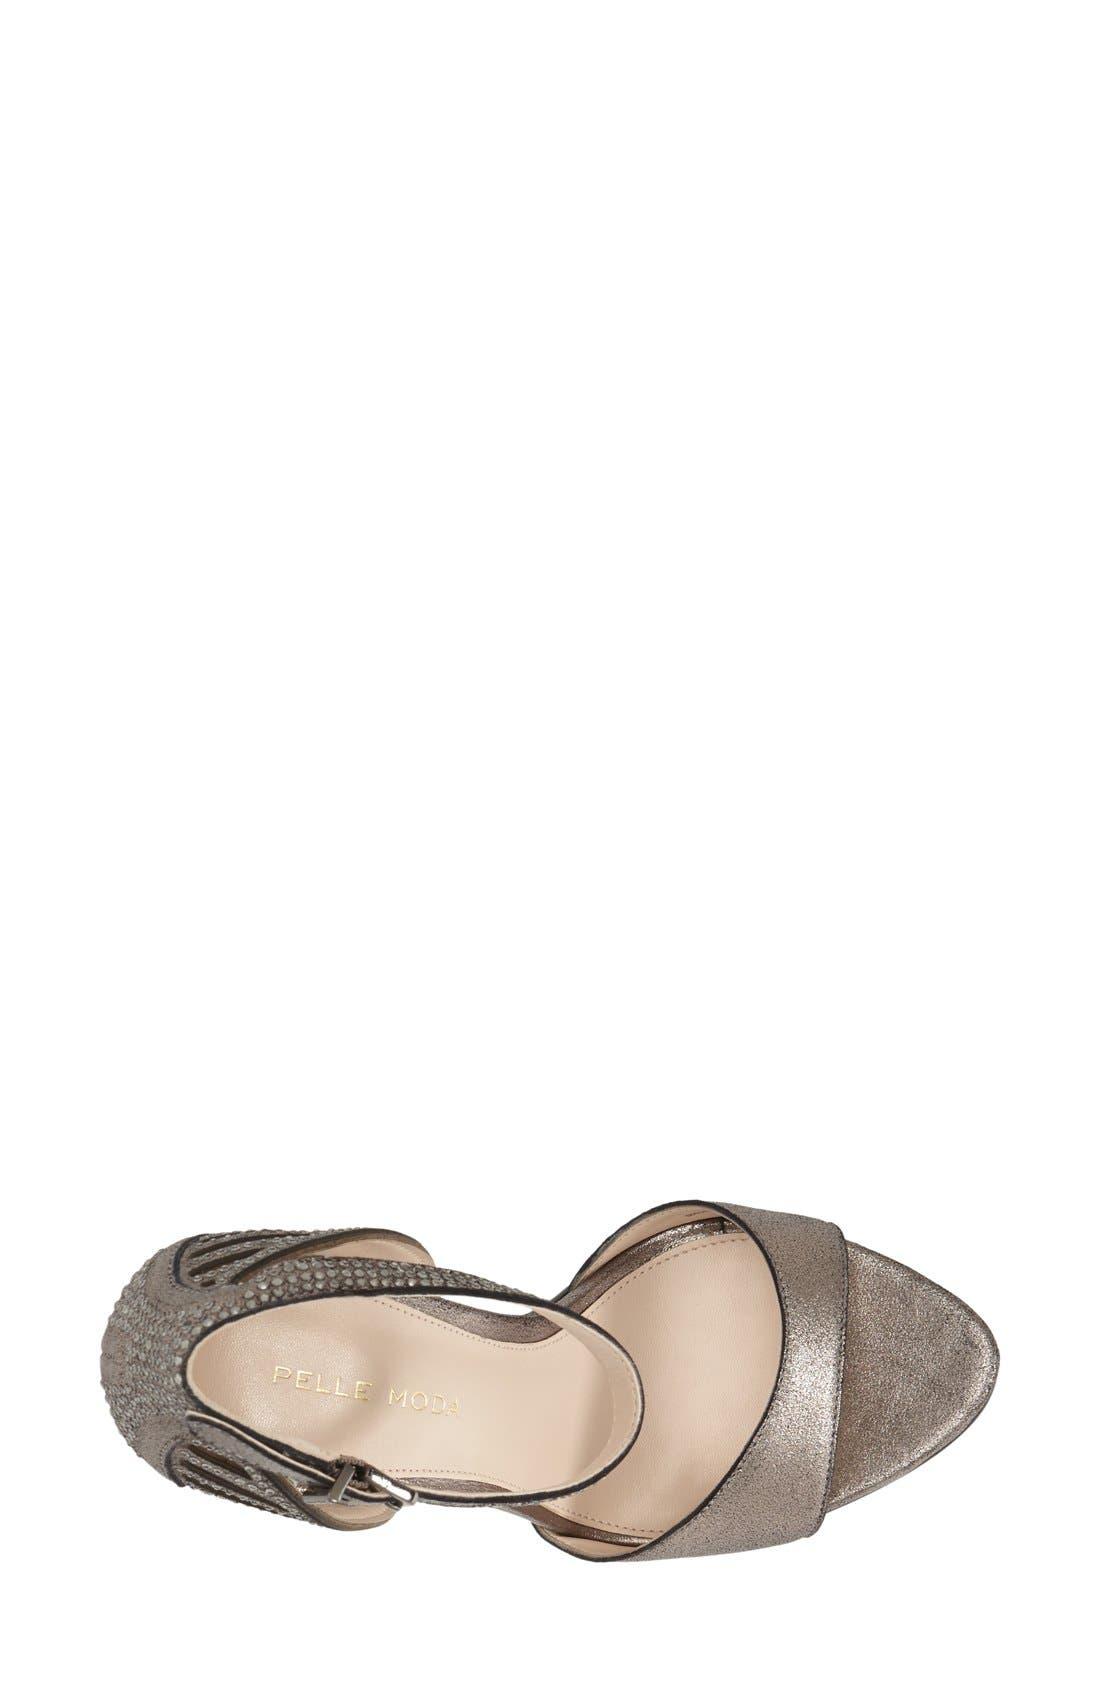 'Fenton' Ankle Strap Sandal,                             Alternate thumbnail 10, color,